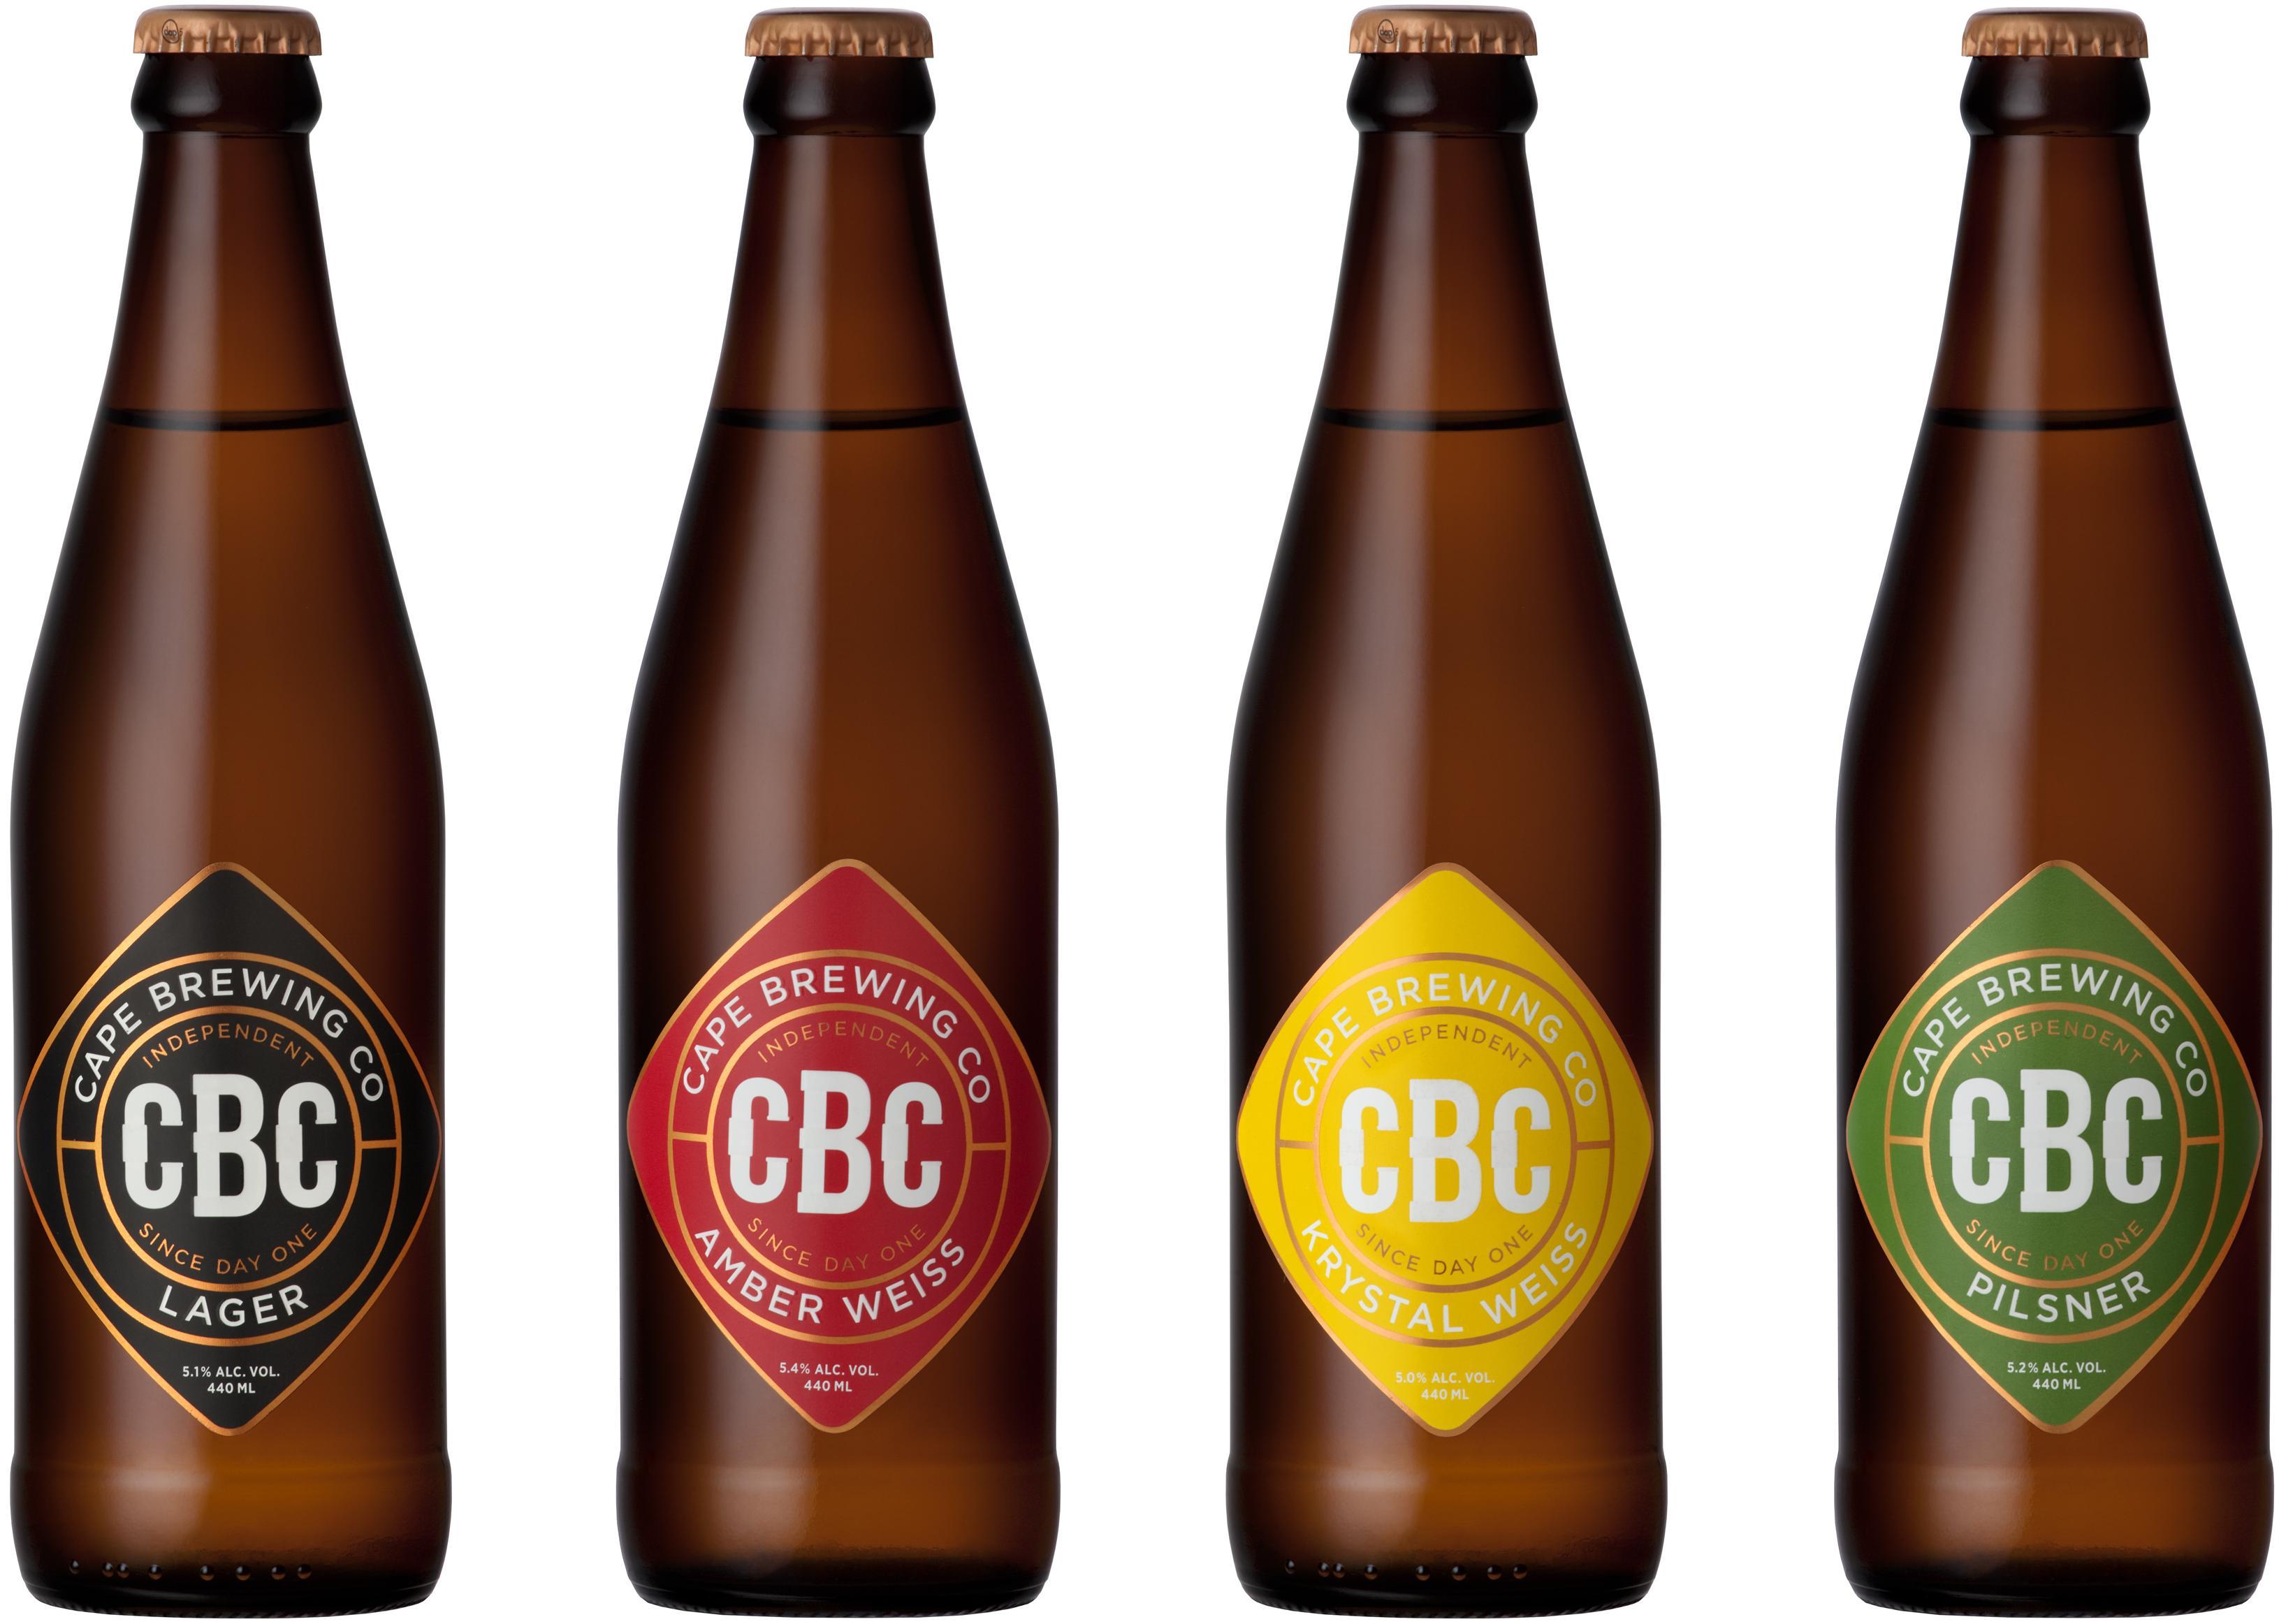 Craft Beer Distributors South Africa